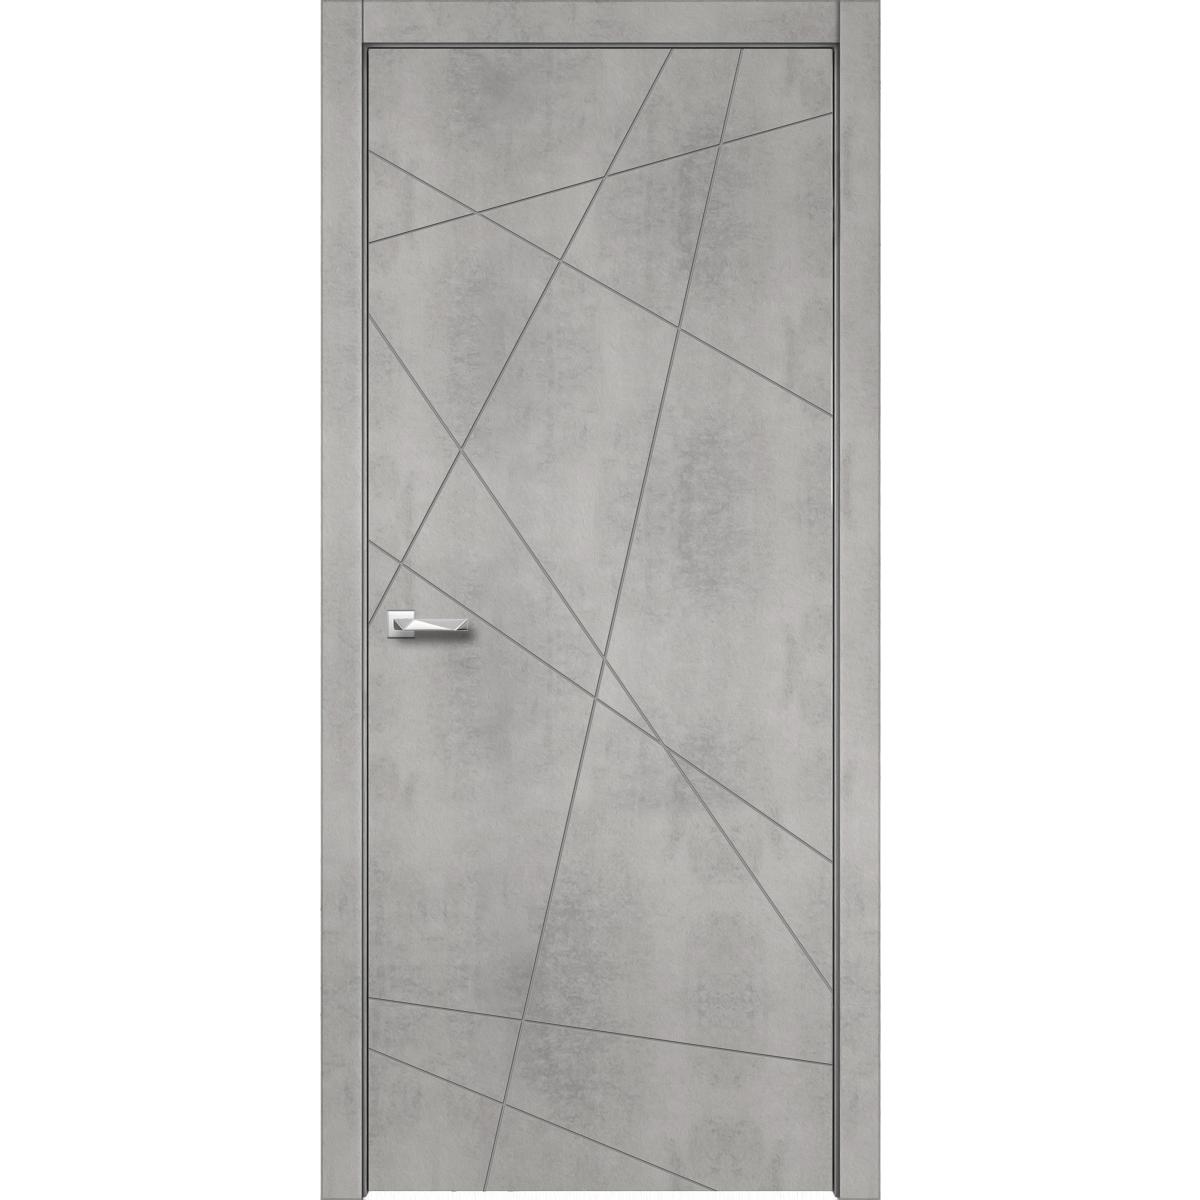 Дверное полотно Loyard Севилья МП_0363 2000х700х44 мм МДФ